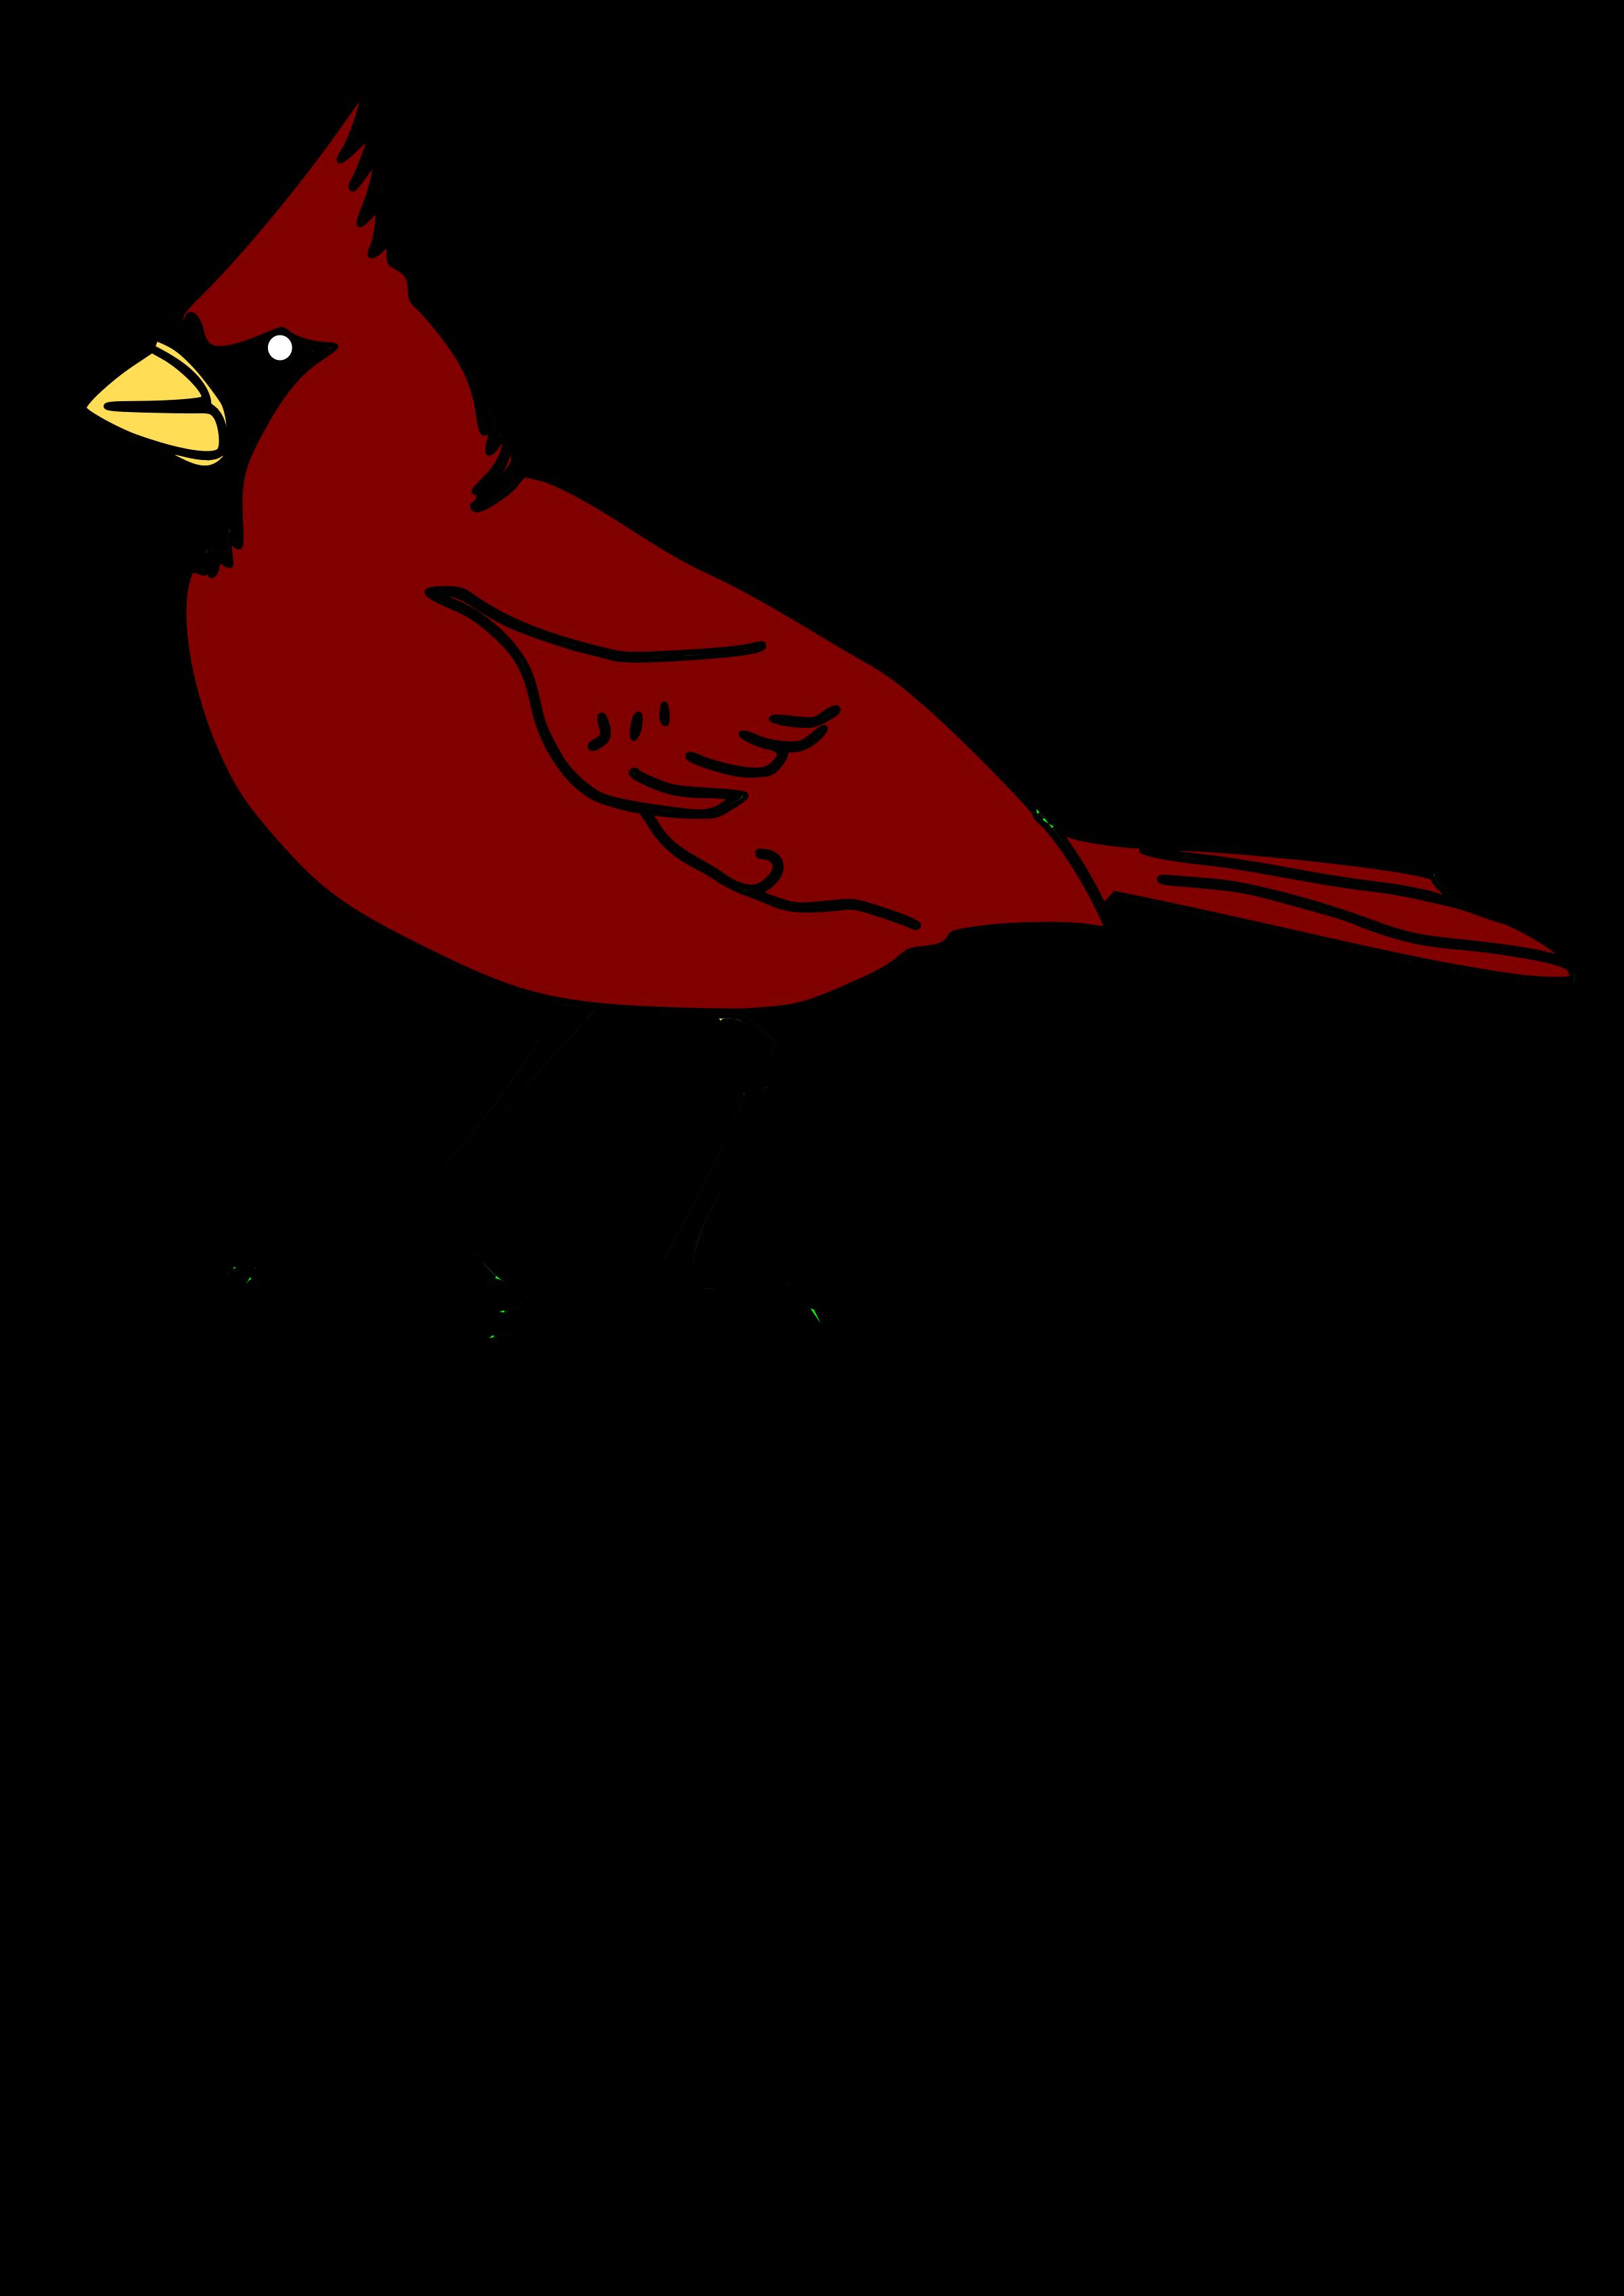 Cardinal clipart transparent background.